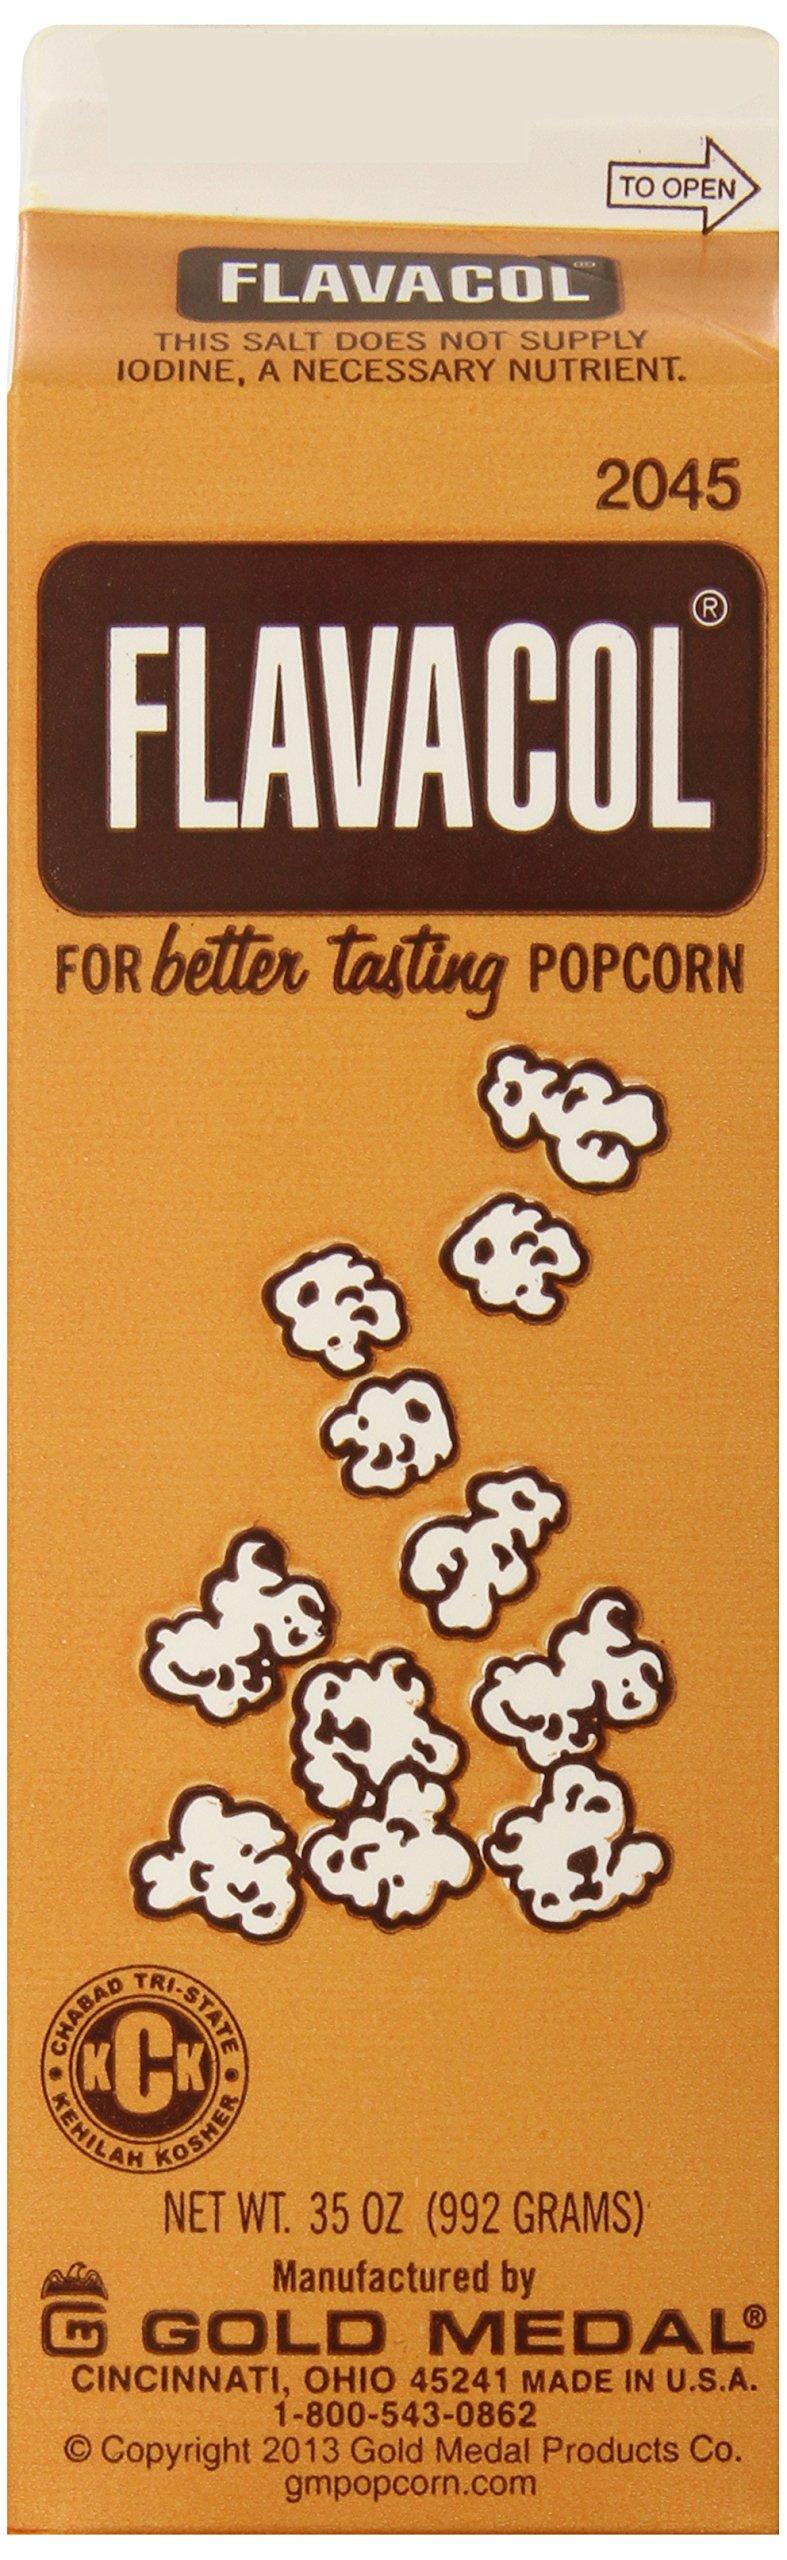 Gold Medal Prod. 2045 Flavacol Seasoning Popcorn Salt 35oz. by Gold Medal Prod.